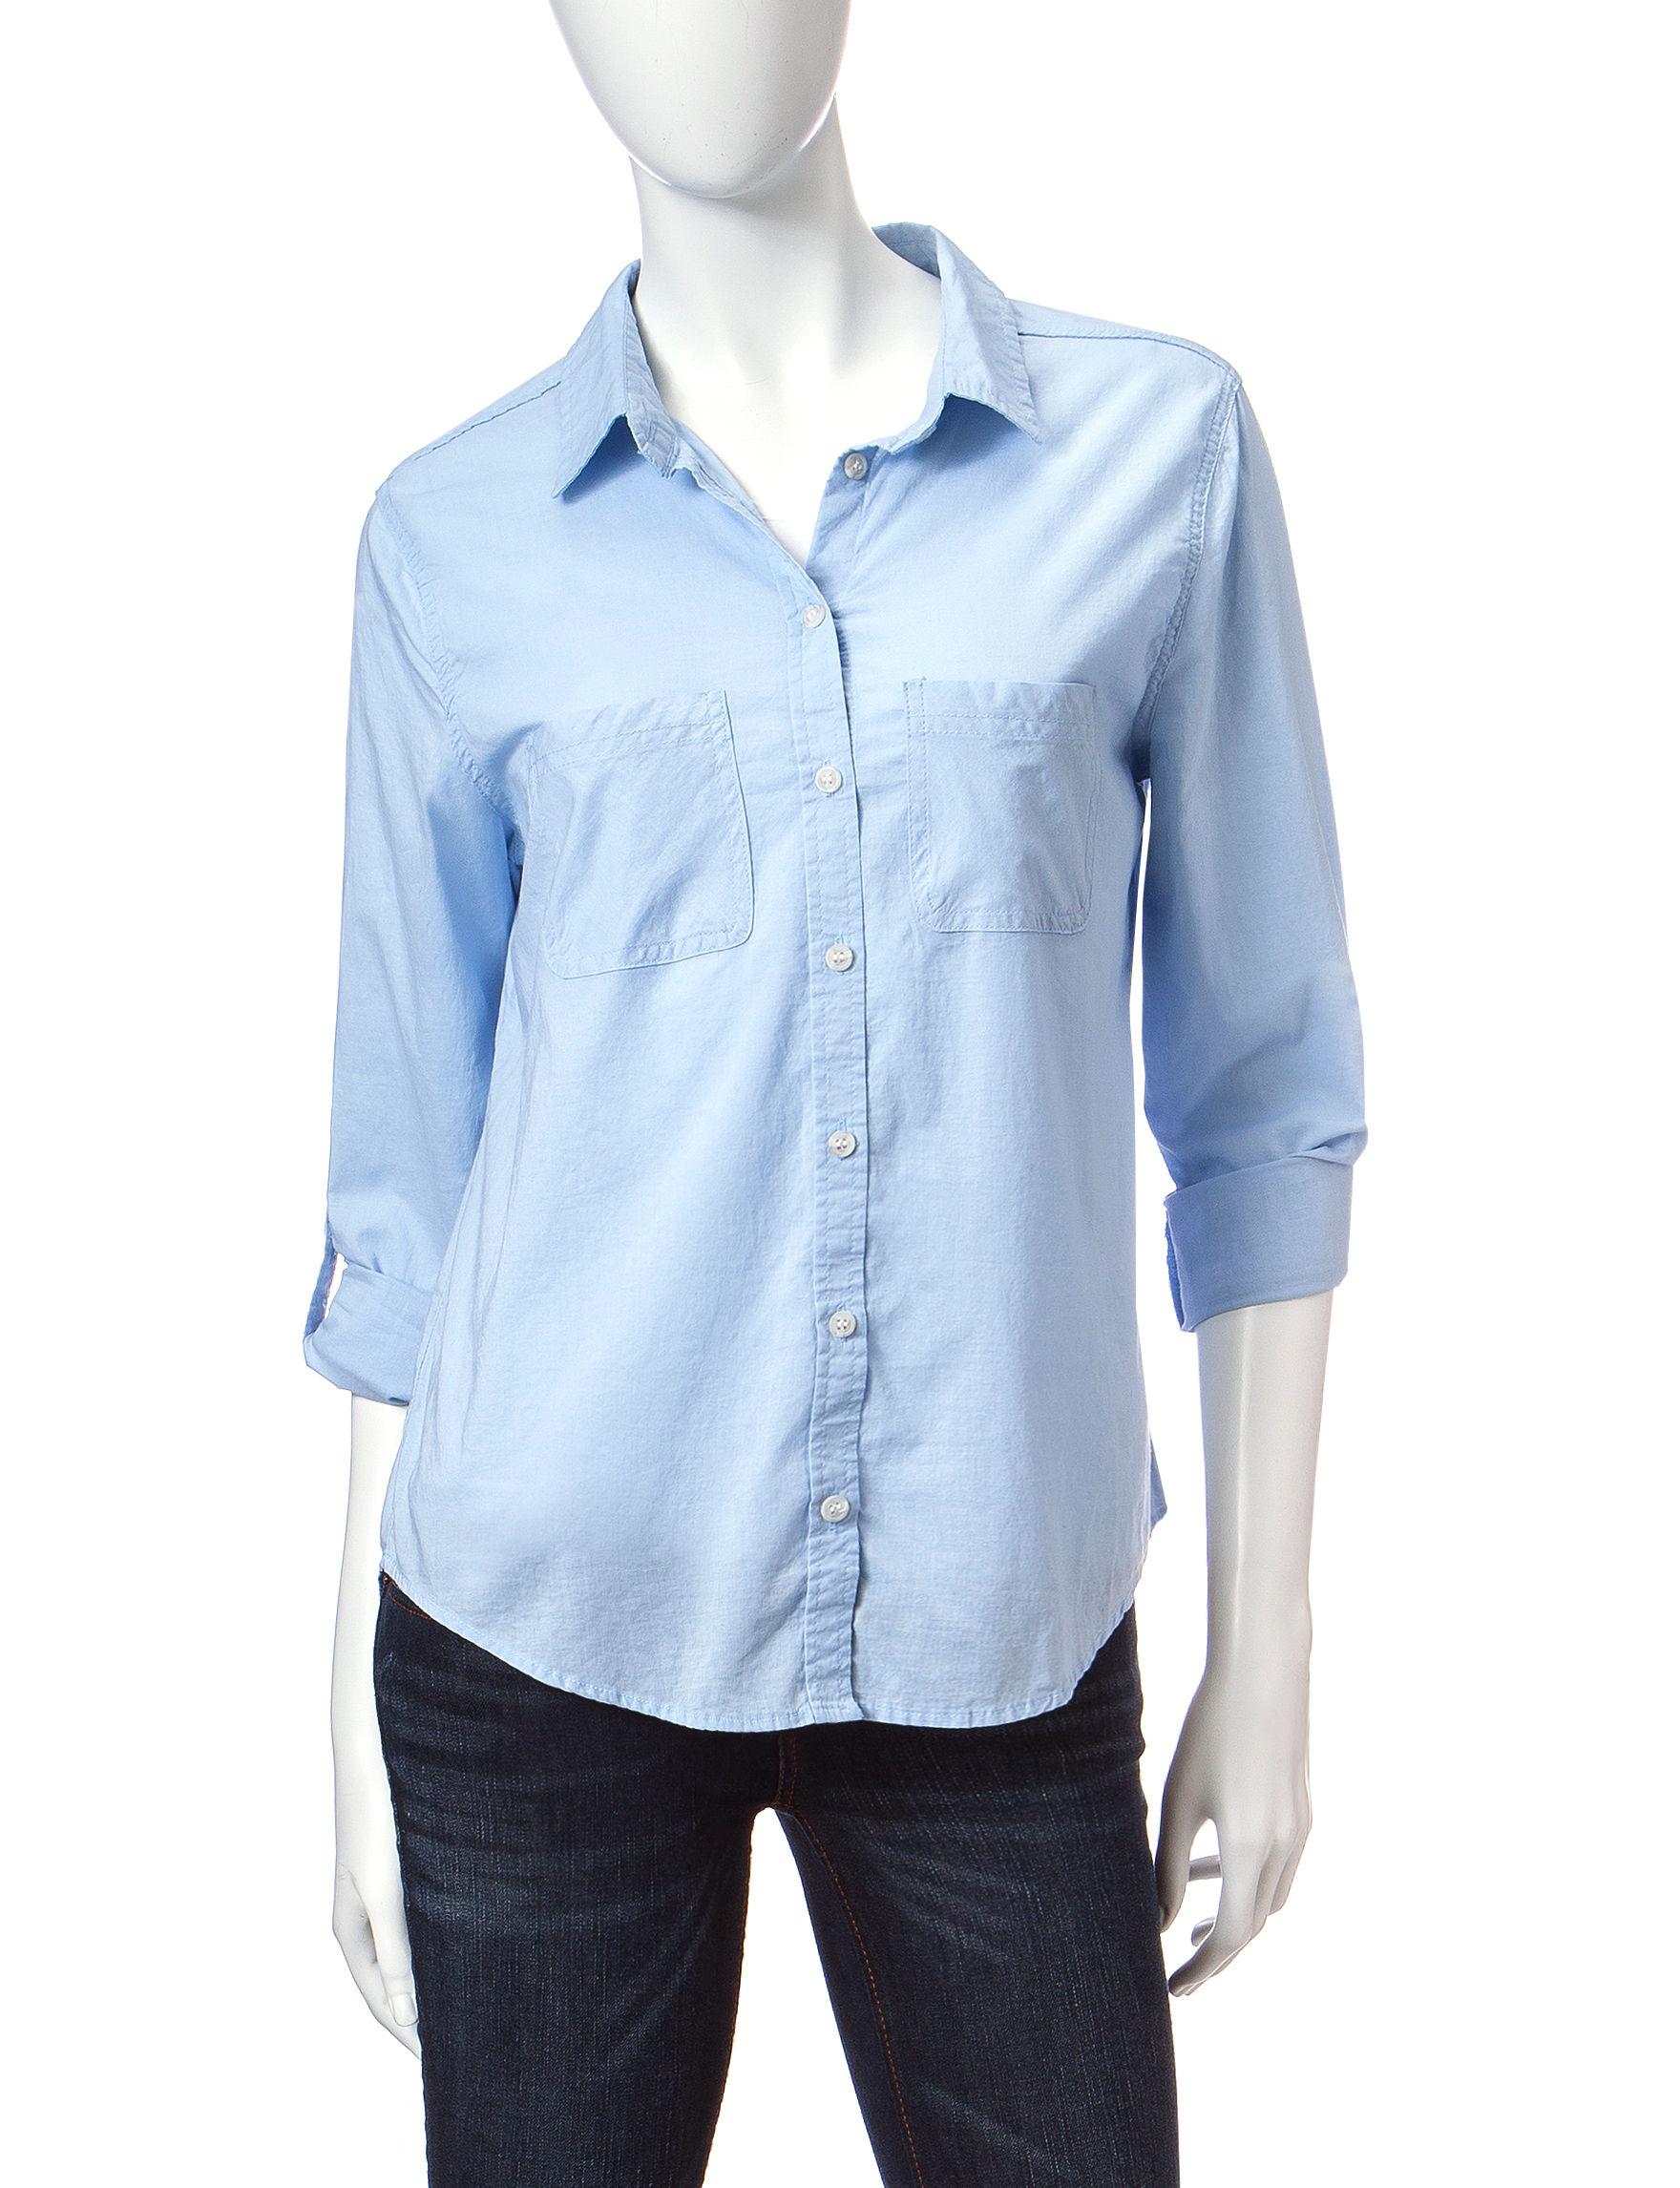 Wishful Park Light Blue Casual Button Down Shirts